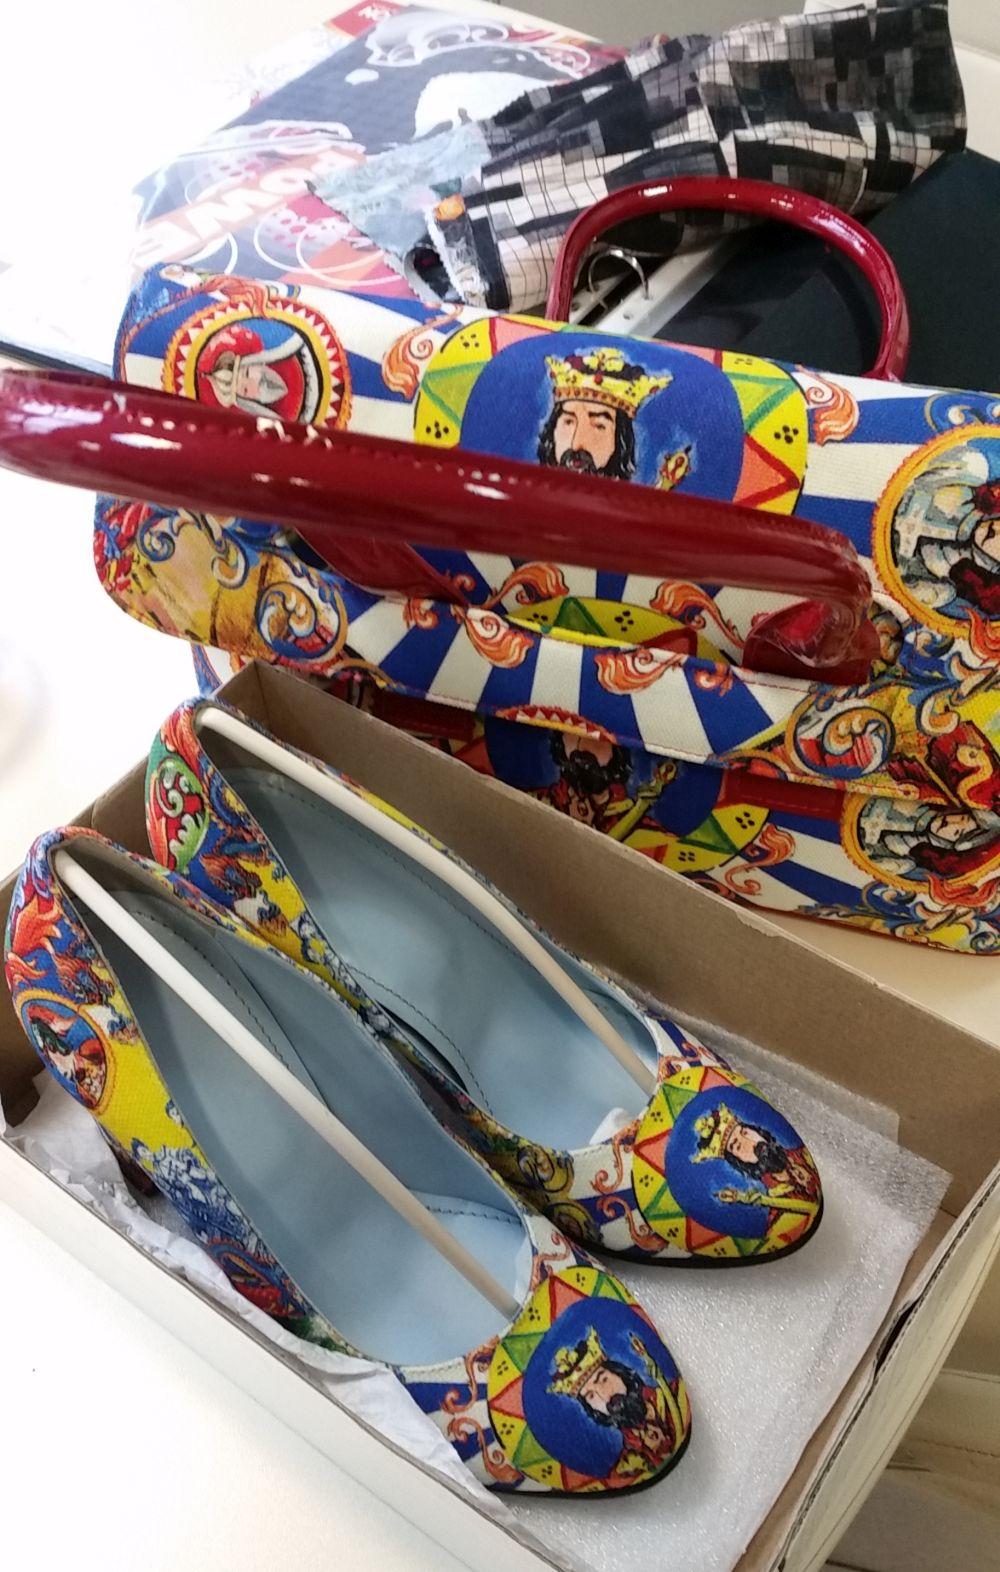 adelaparvu.com despre print digital, Foto la Dacora Print cu tehnologie Epson (1)